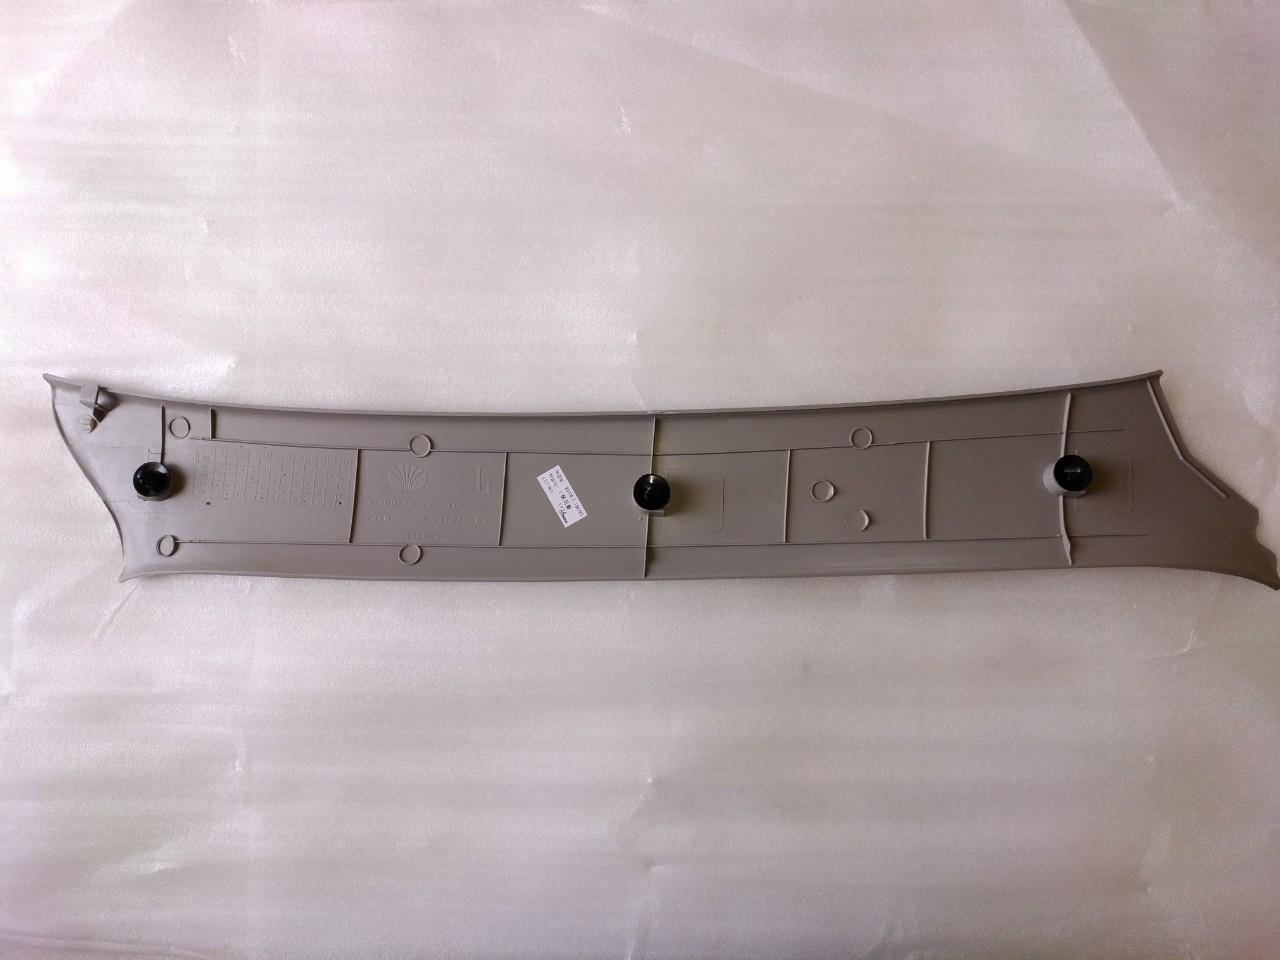 Накладка внутренняя передней стойки левая (лоб. стекла)  Ланос,Сенс GM Корея (ориг)